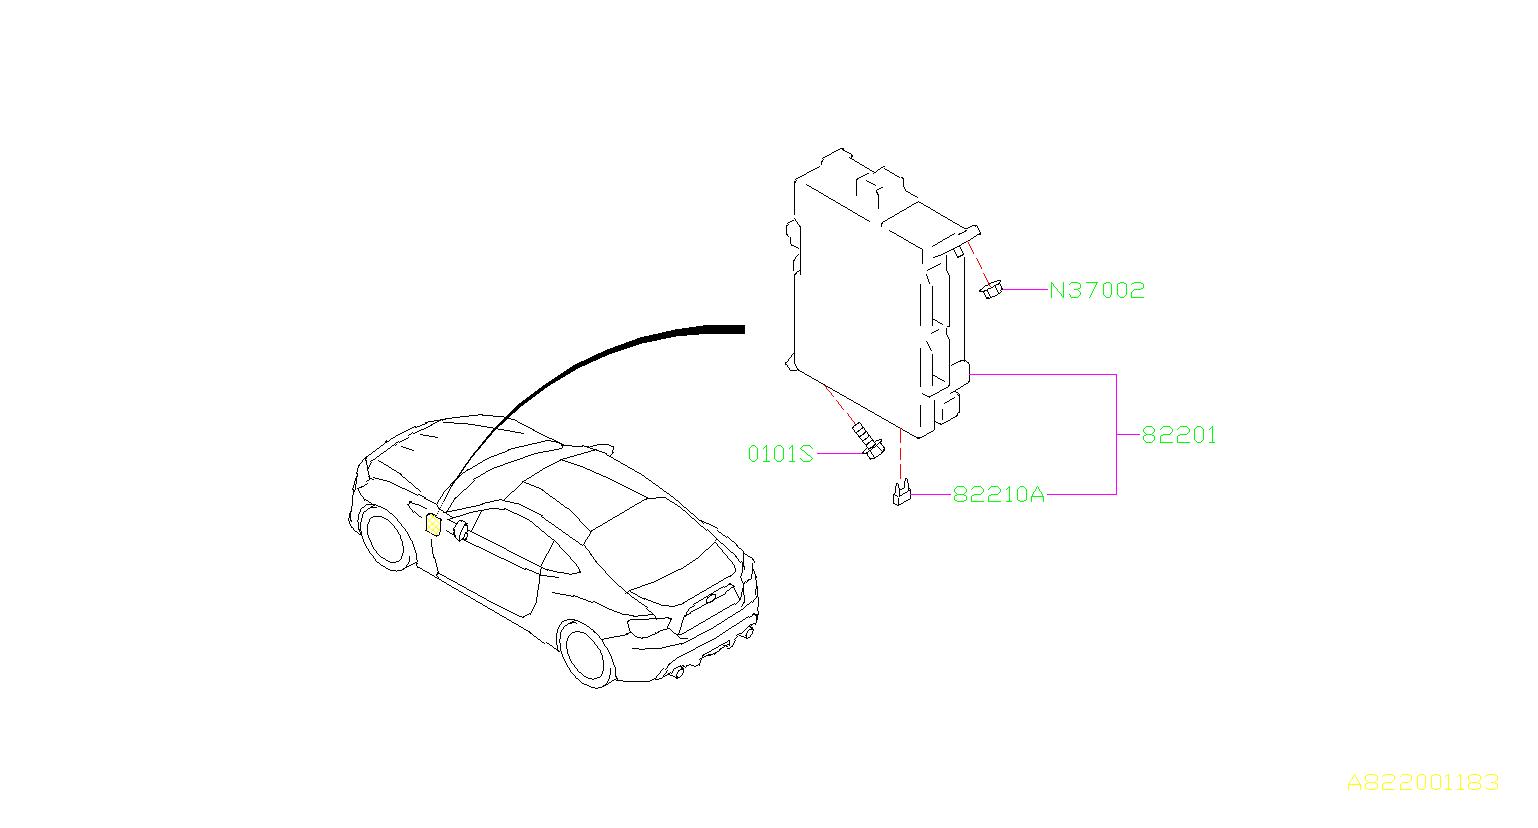 2014 Subaru BRZ Fuse-auto. Box, harness, wiring